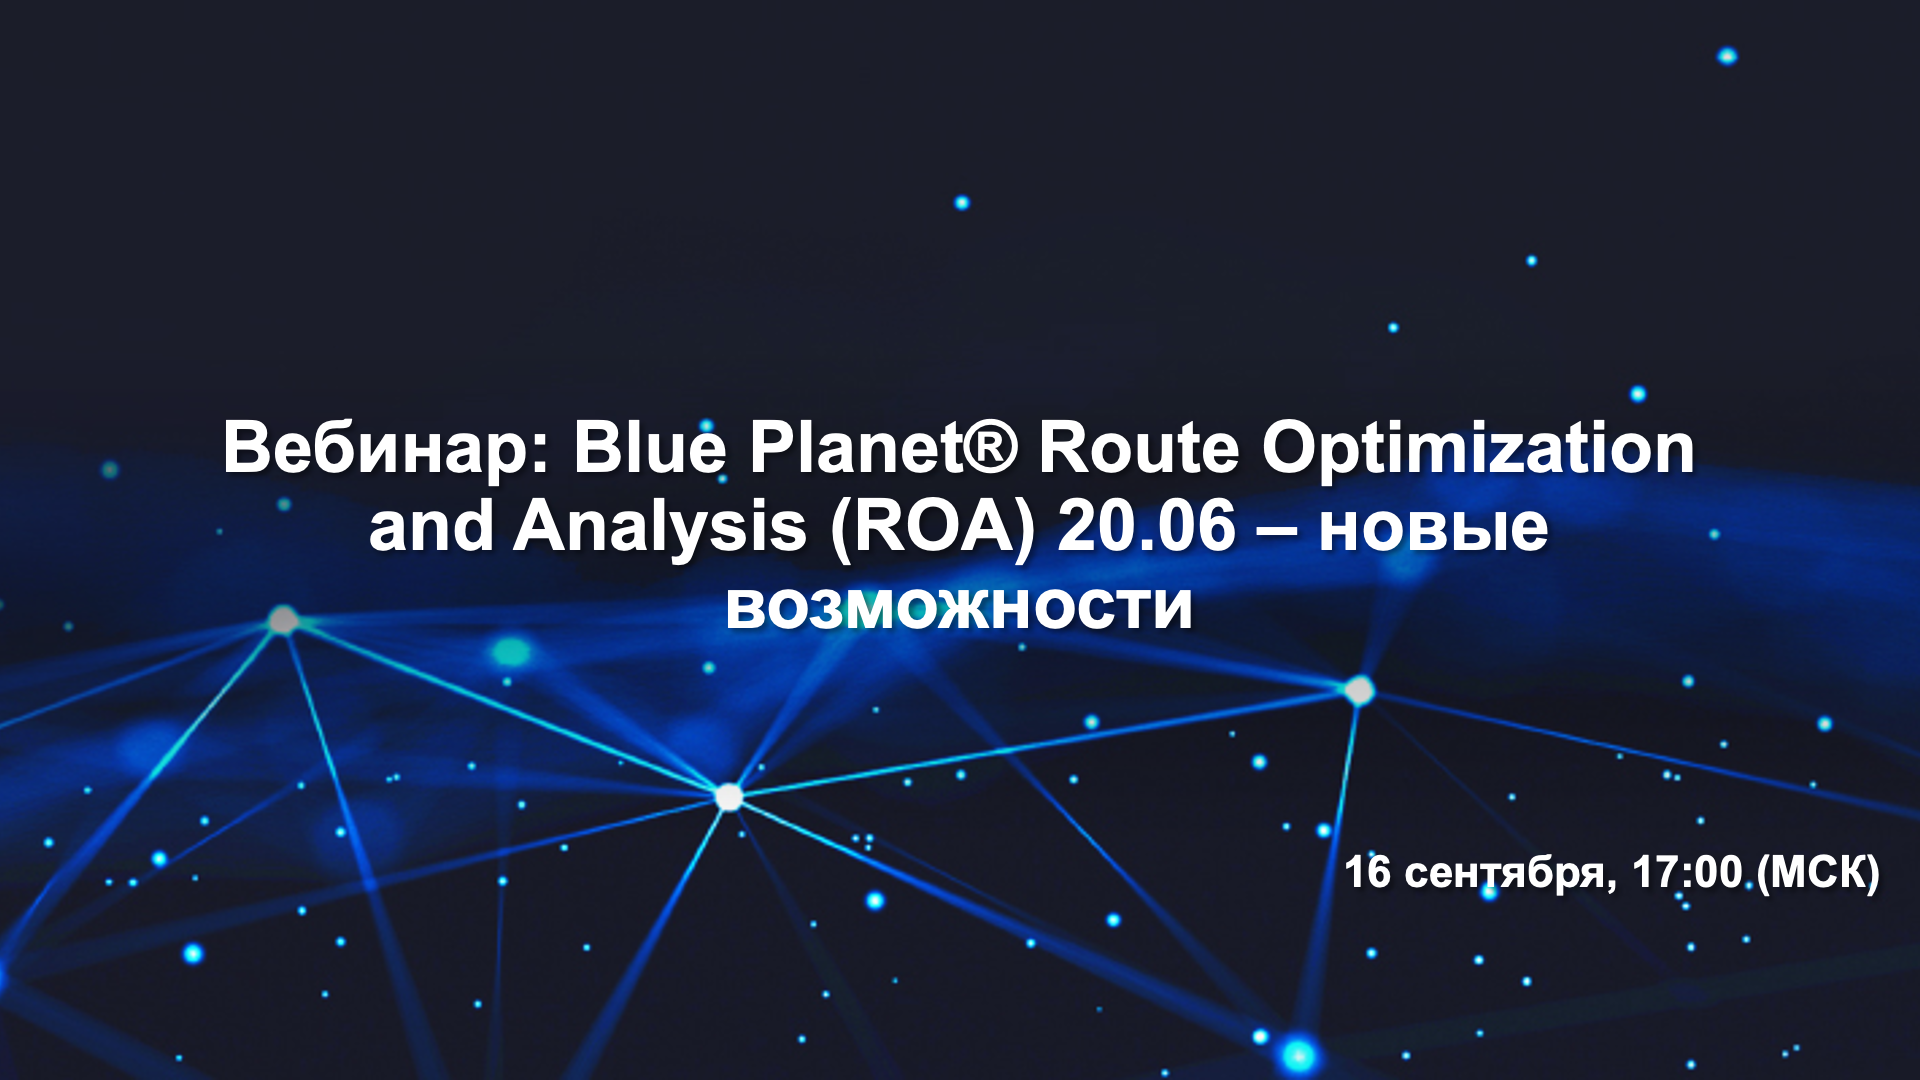 BluePlanet new release 20.06 vebinar